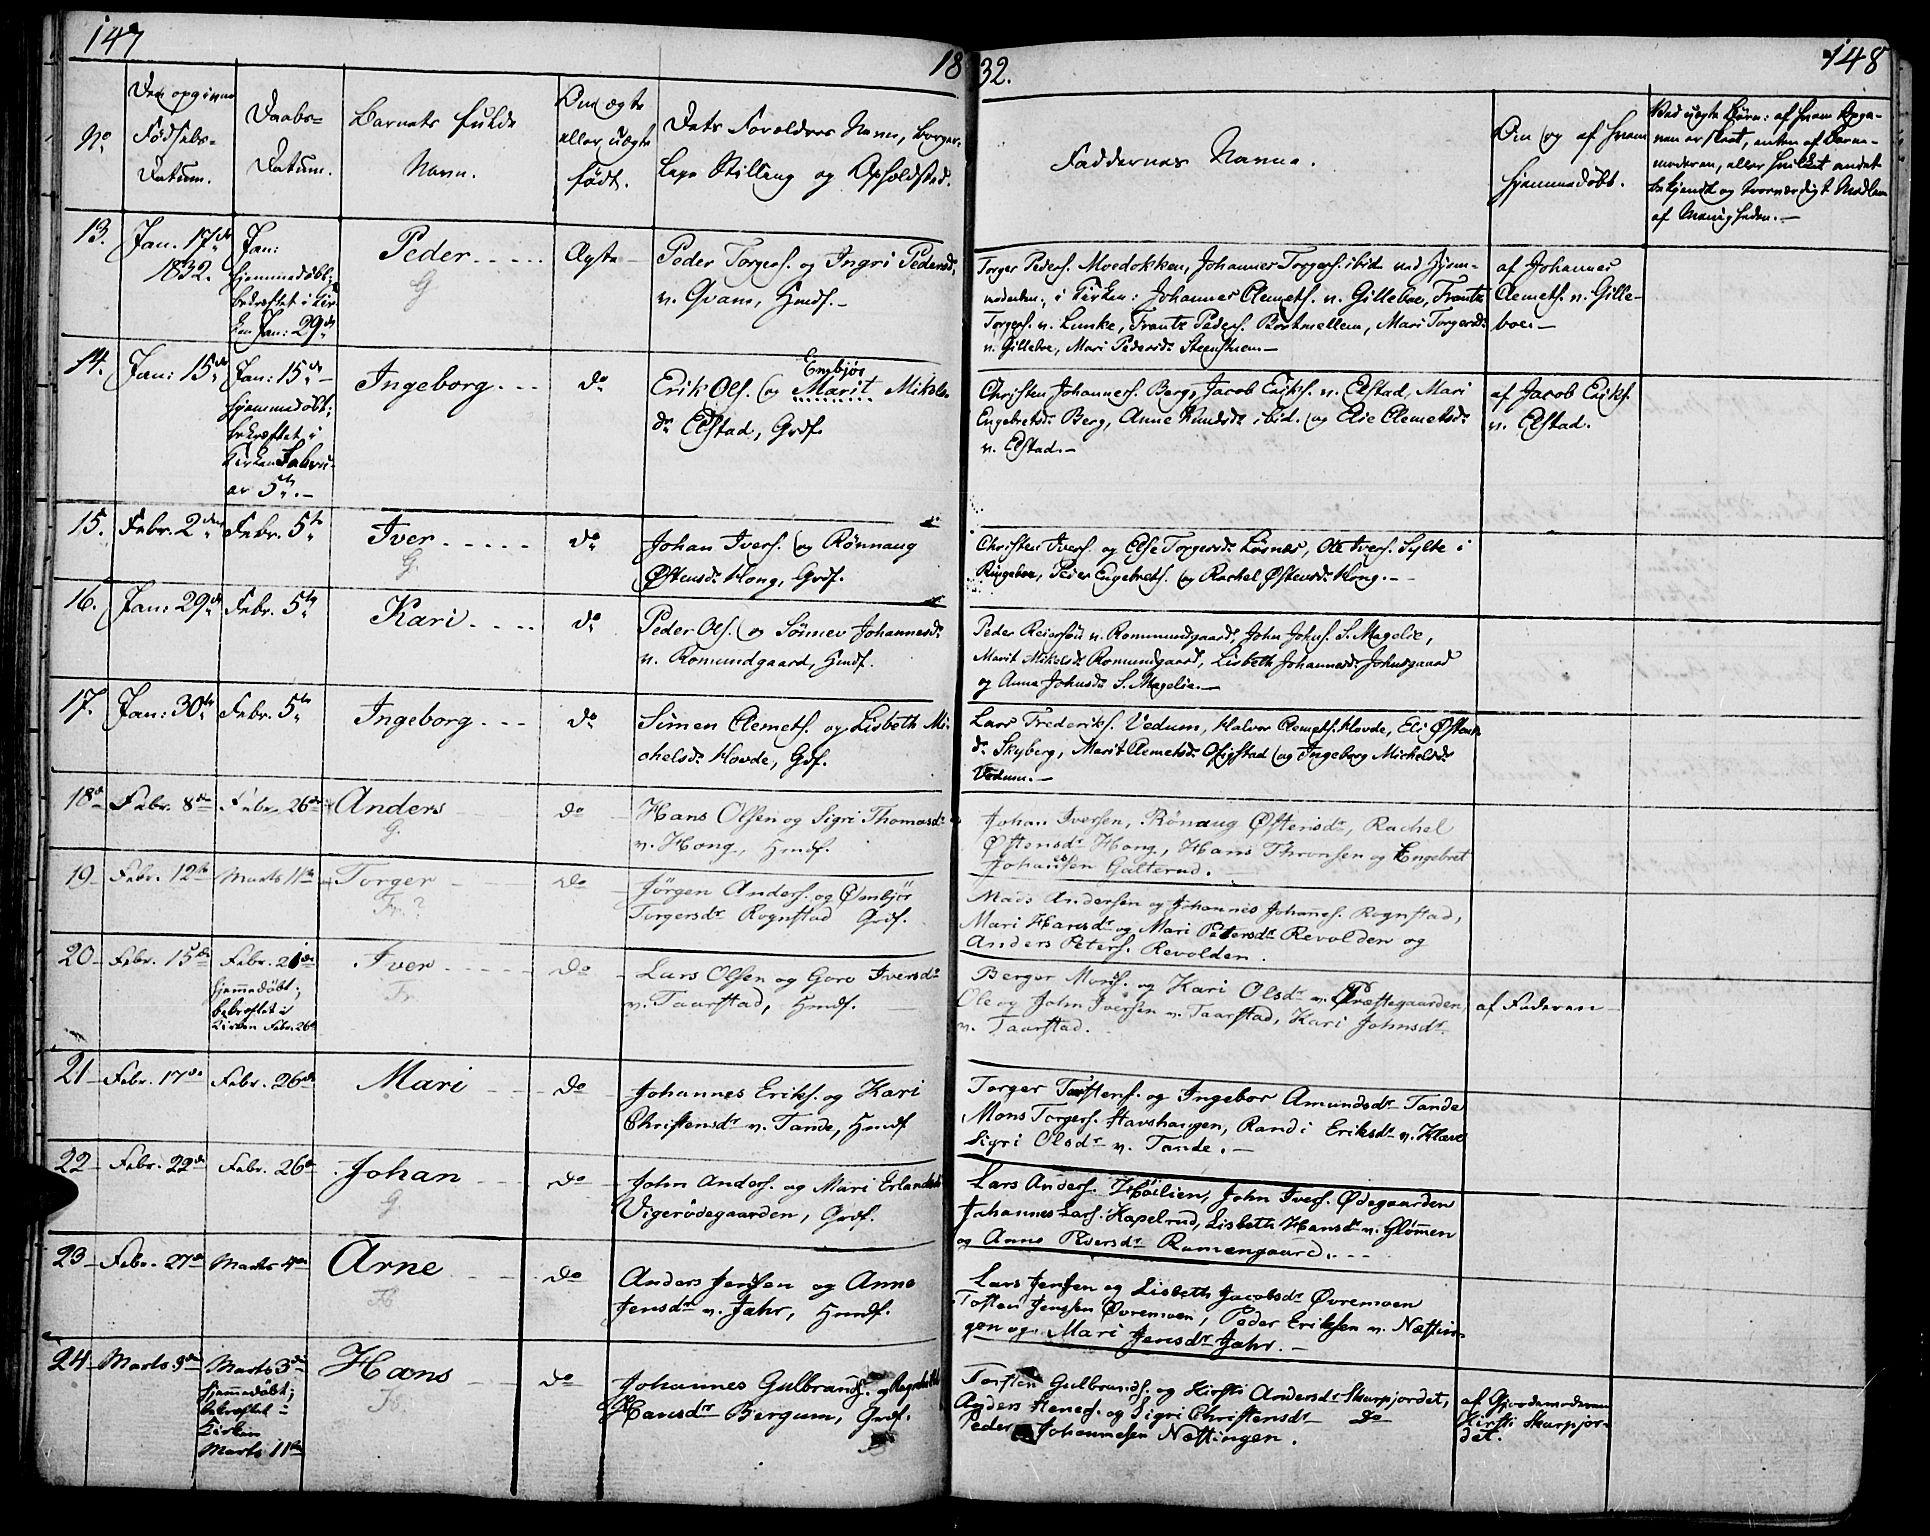 SAH, Øyer prestekontor, Ministerialbok nr. 4, 1824-1841, s. 147-148